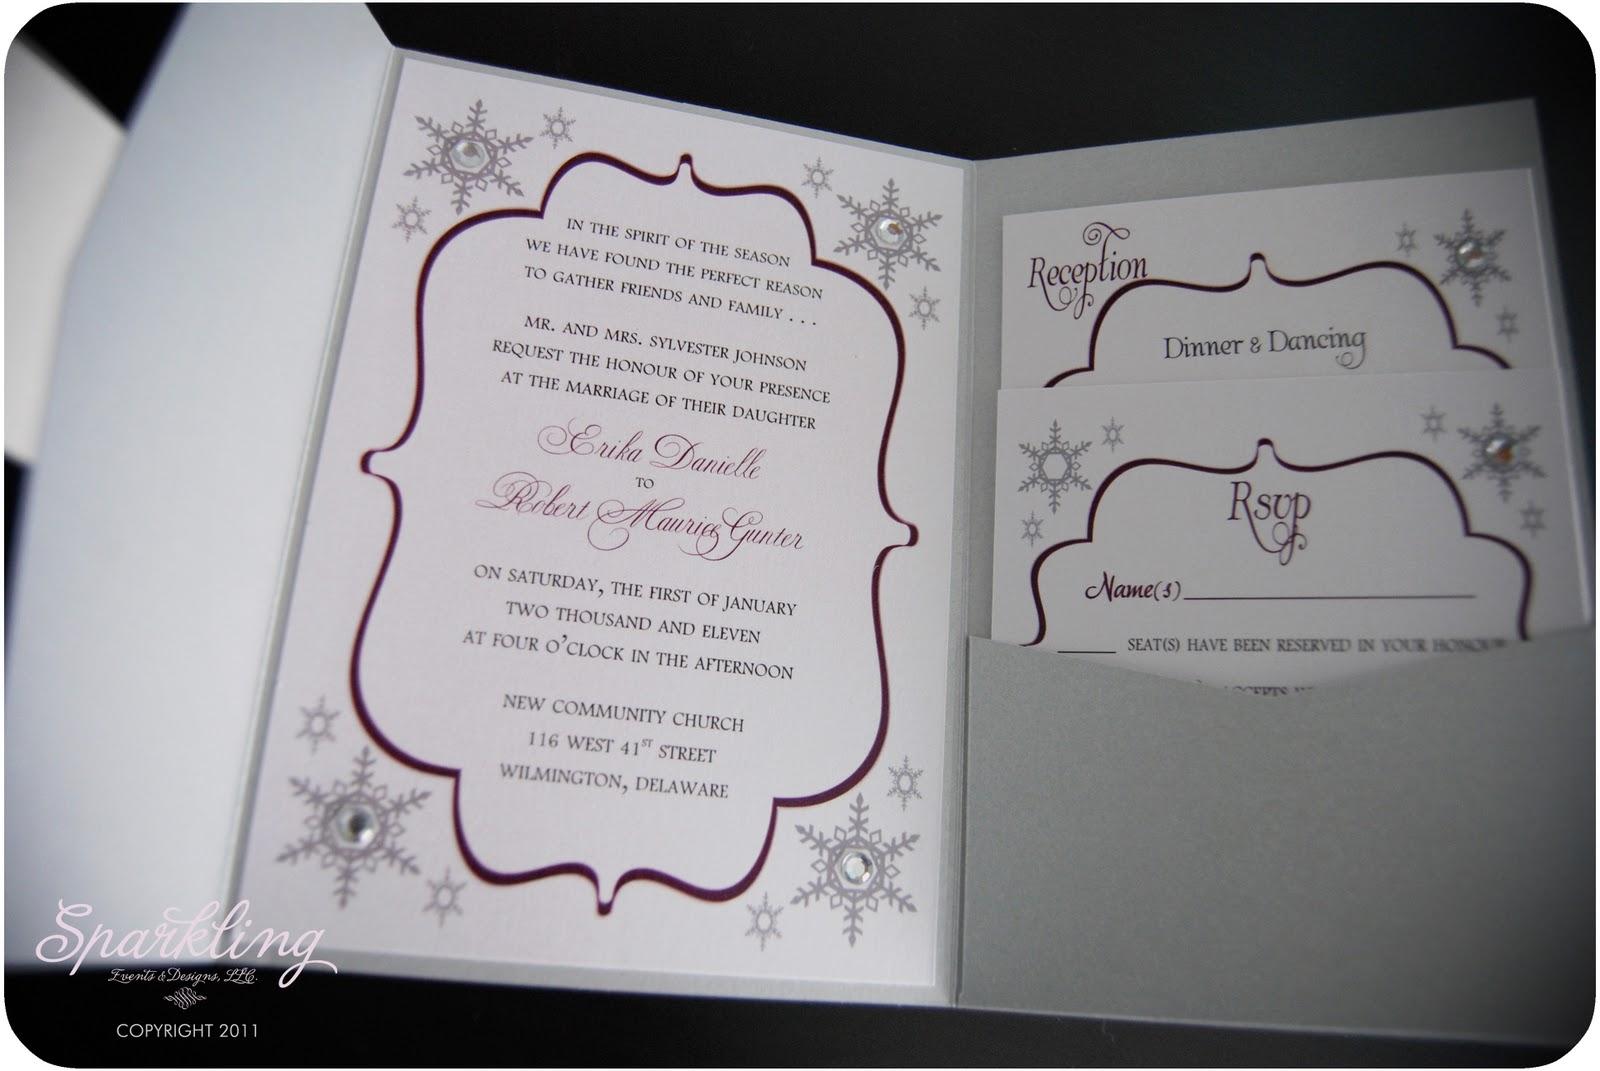 Sparkling Events Amp Designs Real Invitations Winter Wonderland Snowflake Wedding Invitation